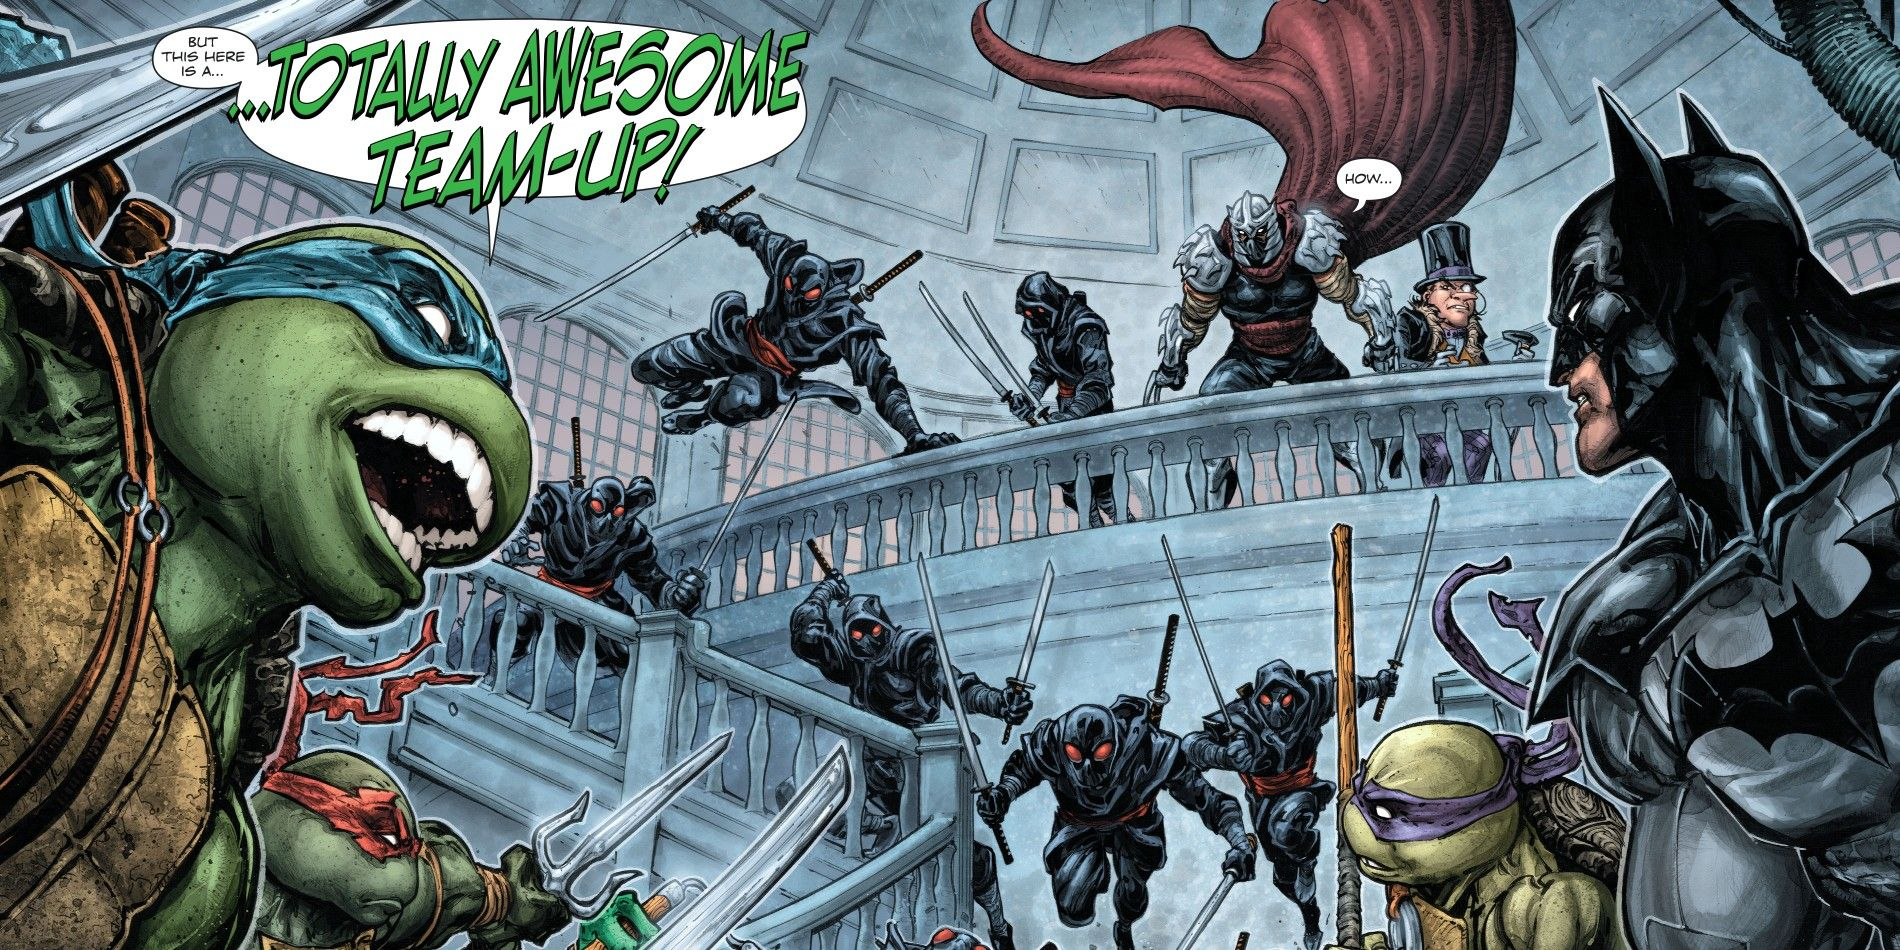 Batman Vs Teenage Mutant Ninja Turtles Gets A Release Date